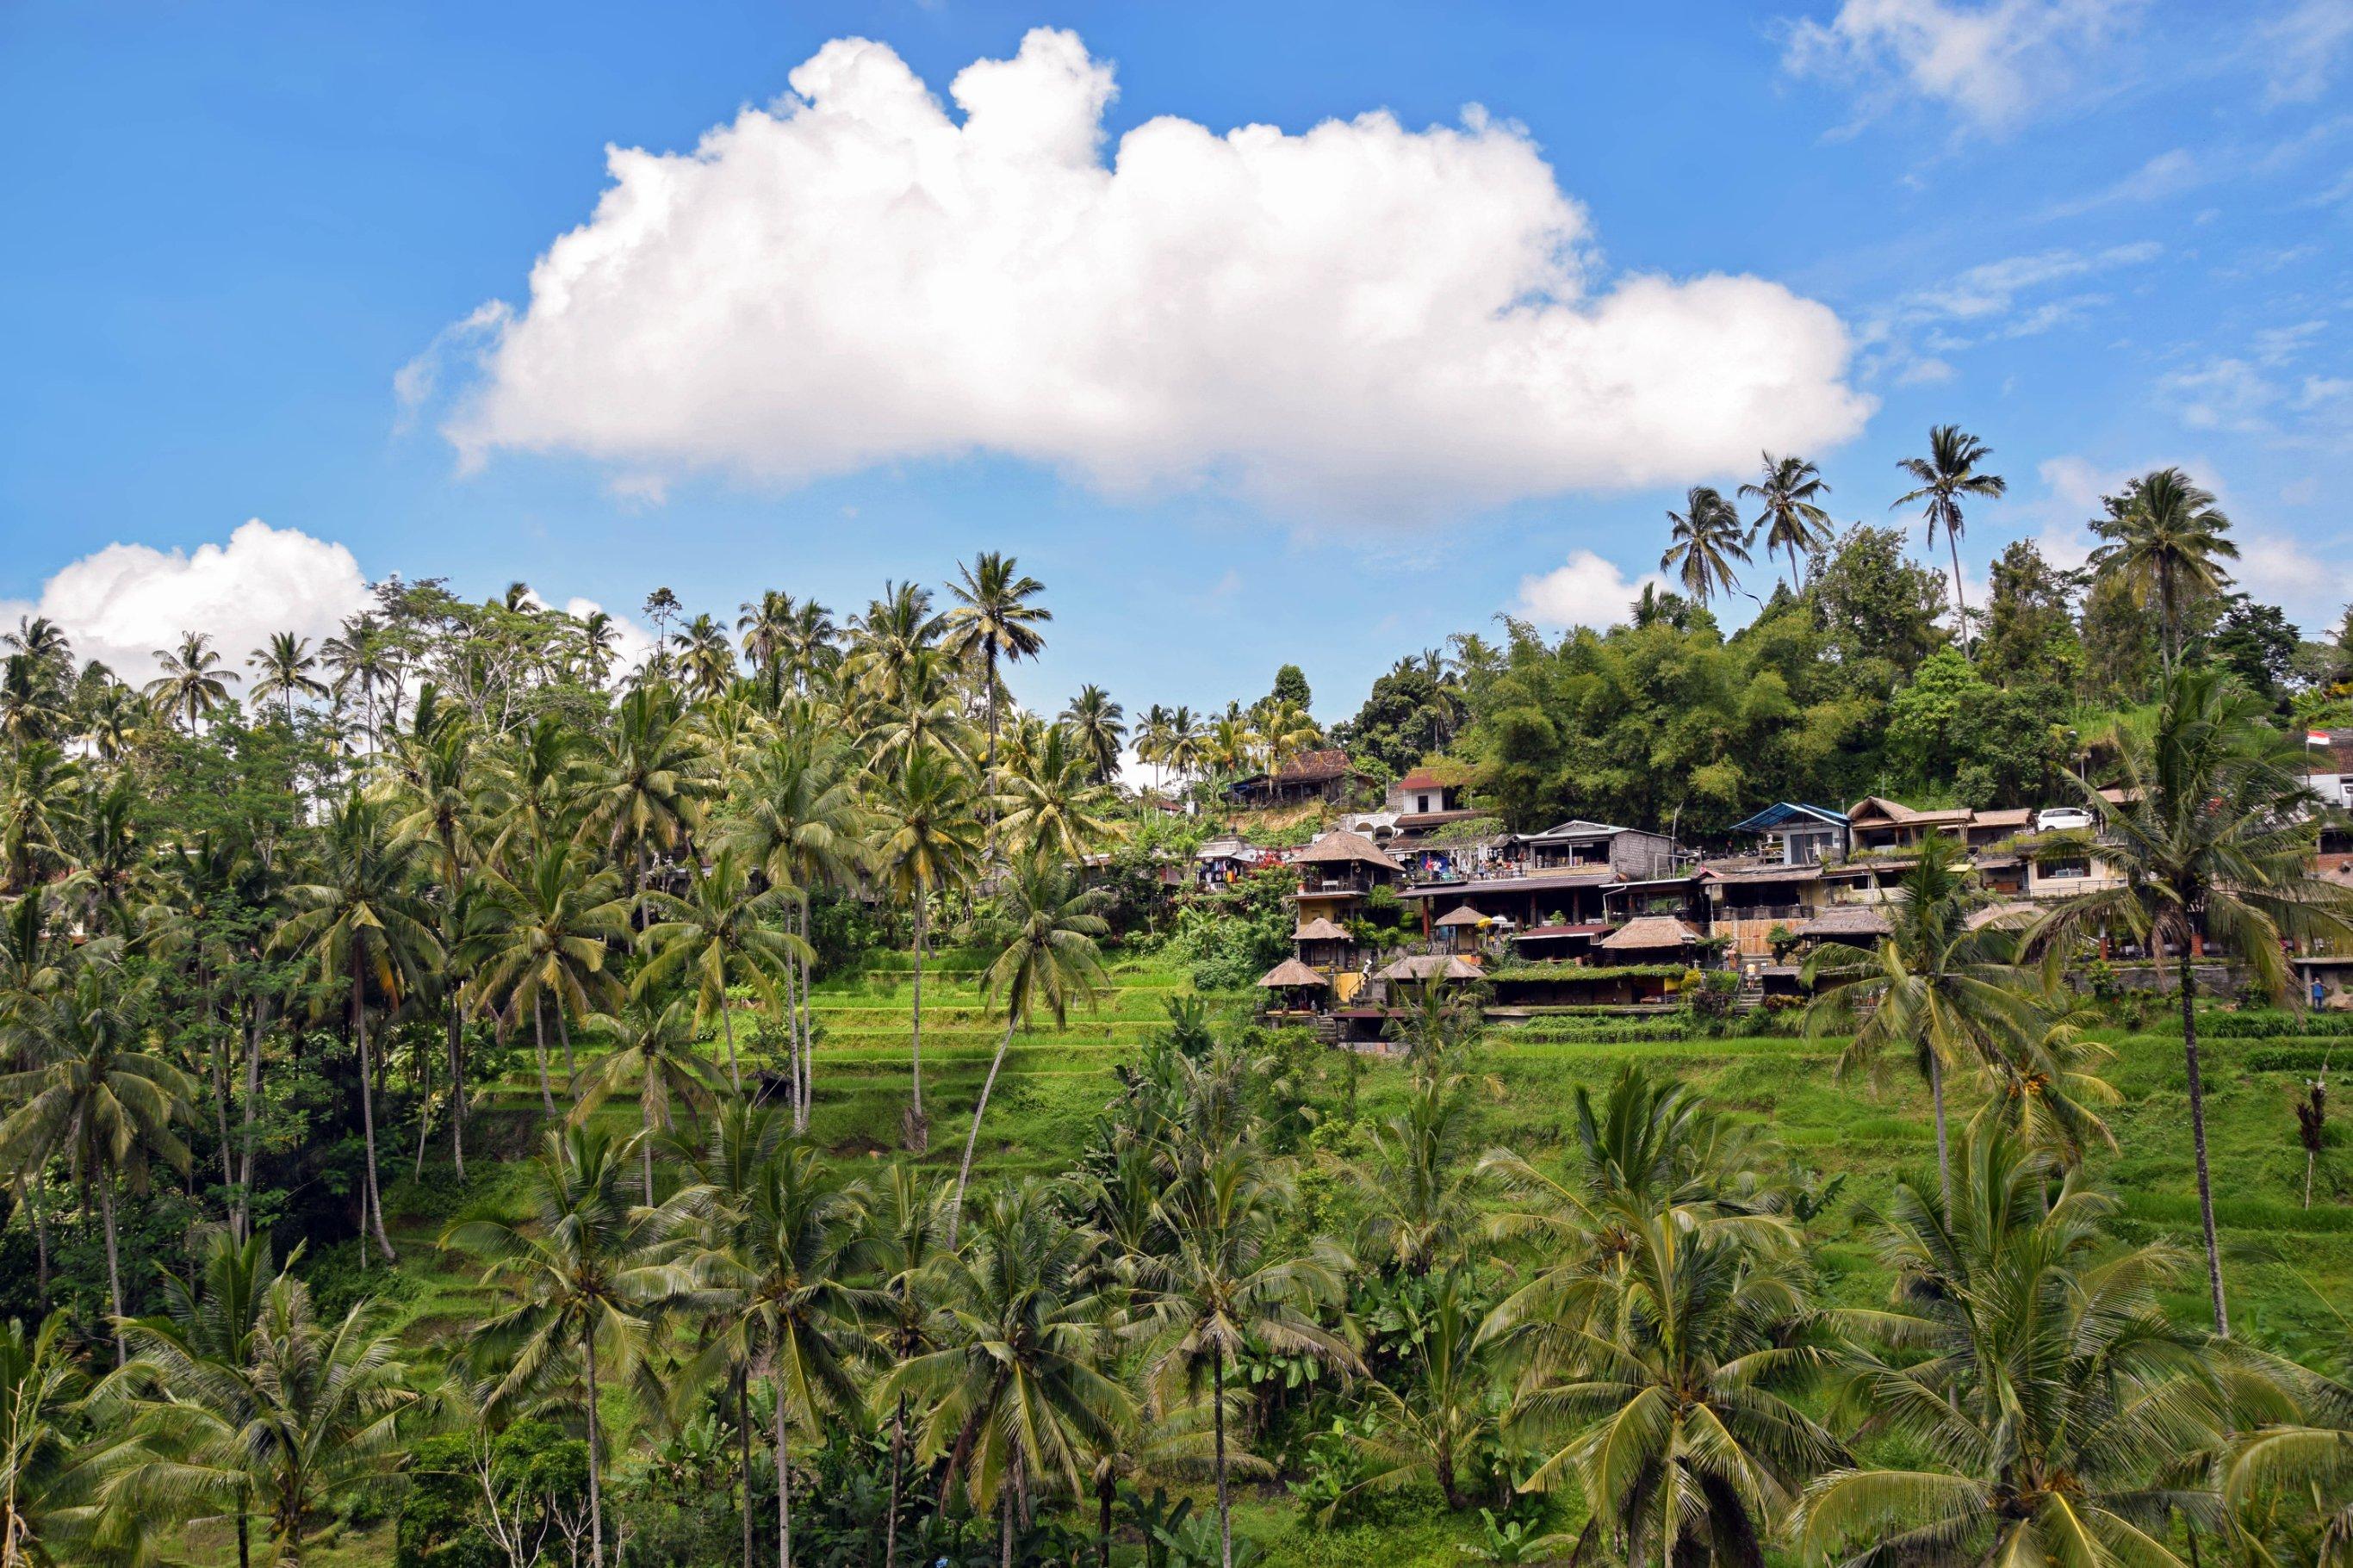 10-Day Discover Bali: Ubud, Nusa Lembongan & Seminyak Tour - Indonesia Itinerary